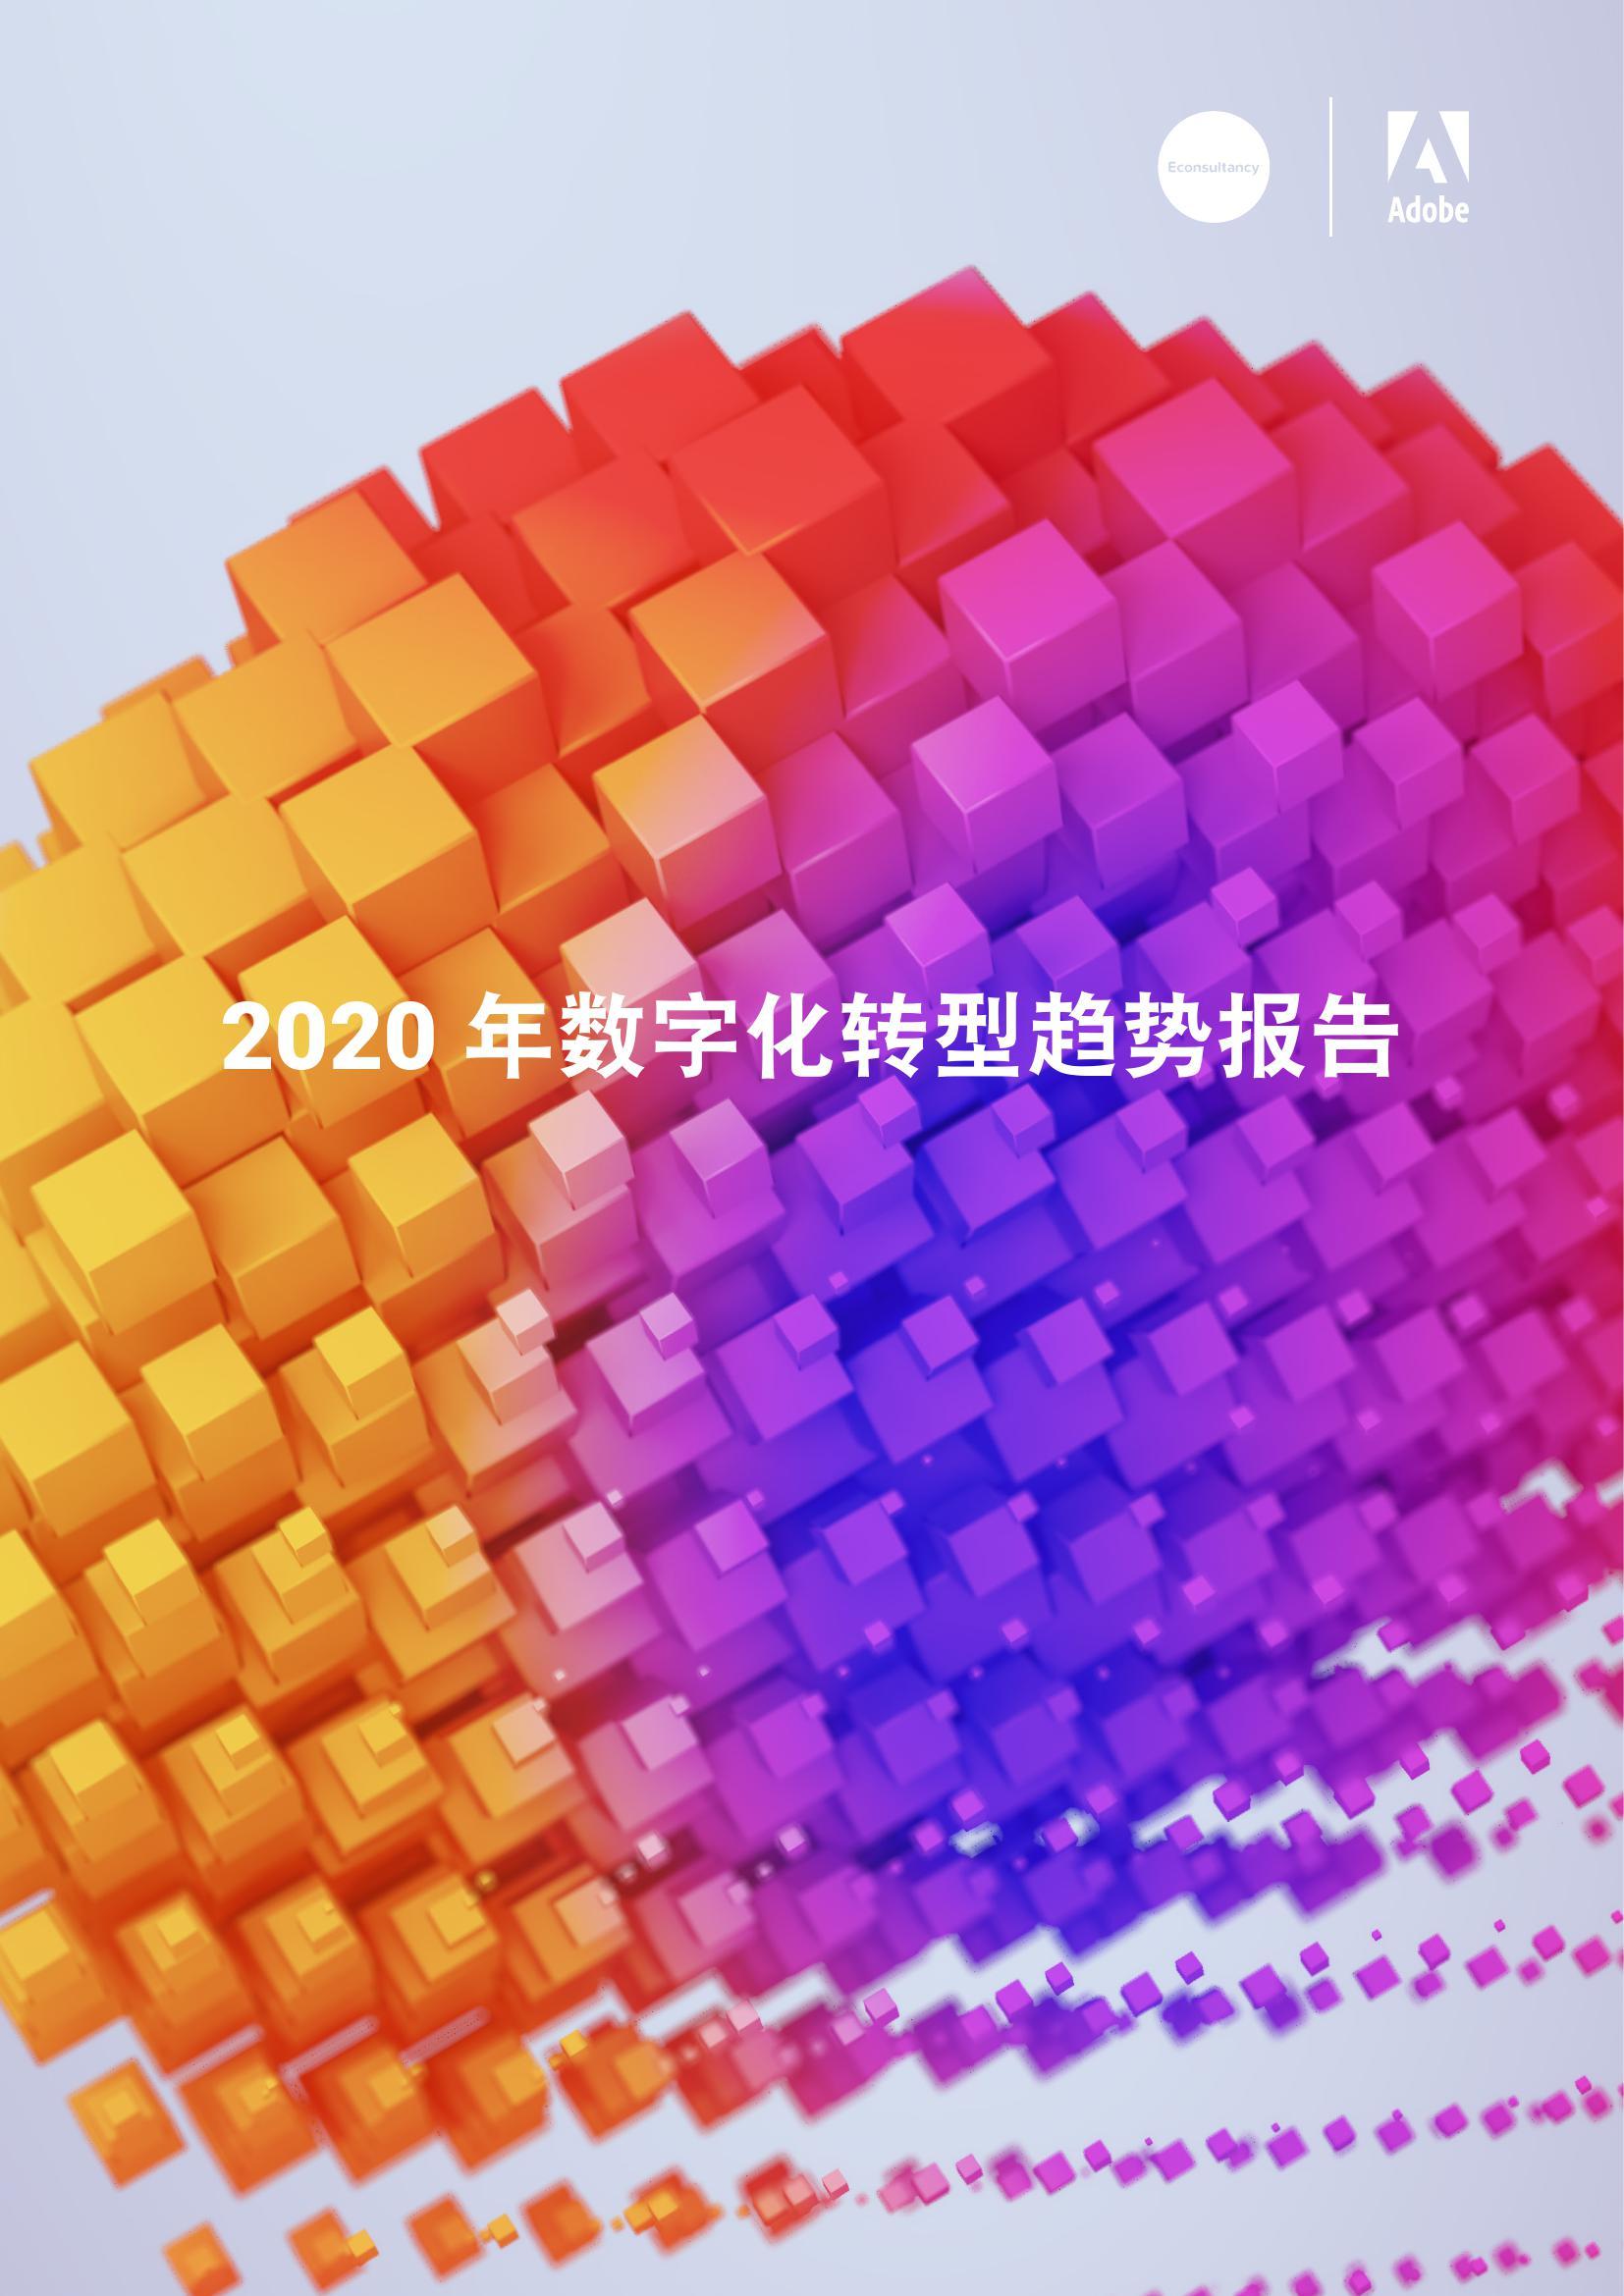 Adobe&Econsultancy:2020年数字化转型趋势报告